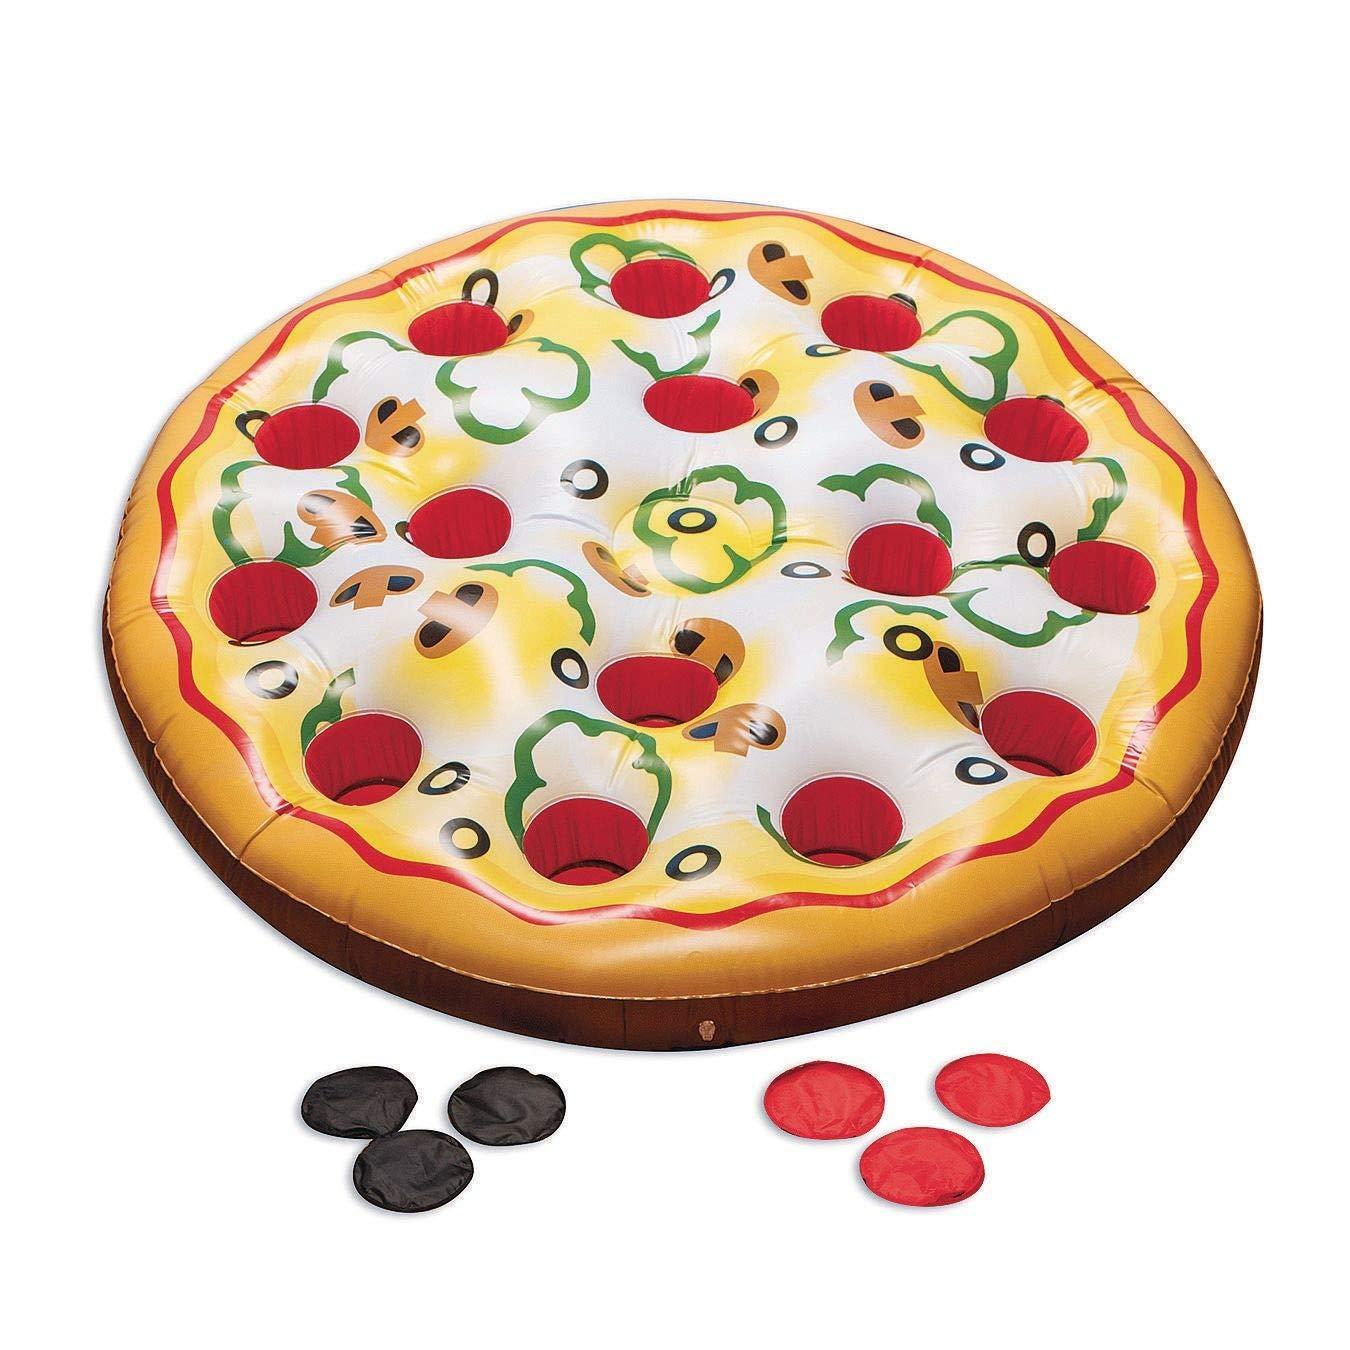 SS Worldwide Jumbo Inflatable Pizza 4' Super special price Phoenix Mall Game Diameter Toss